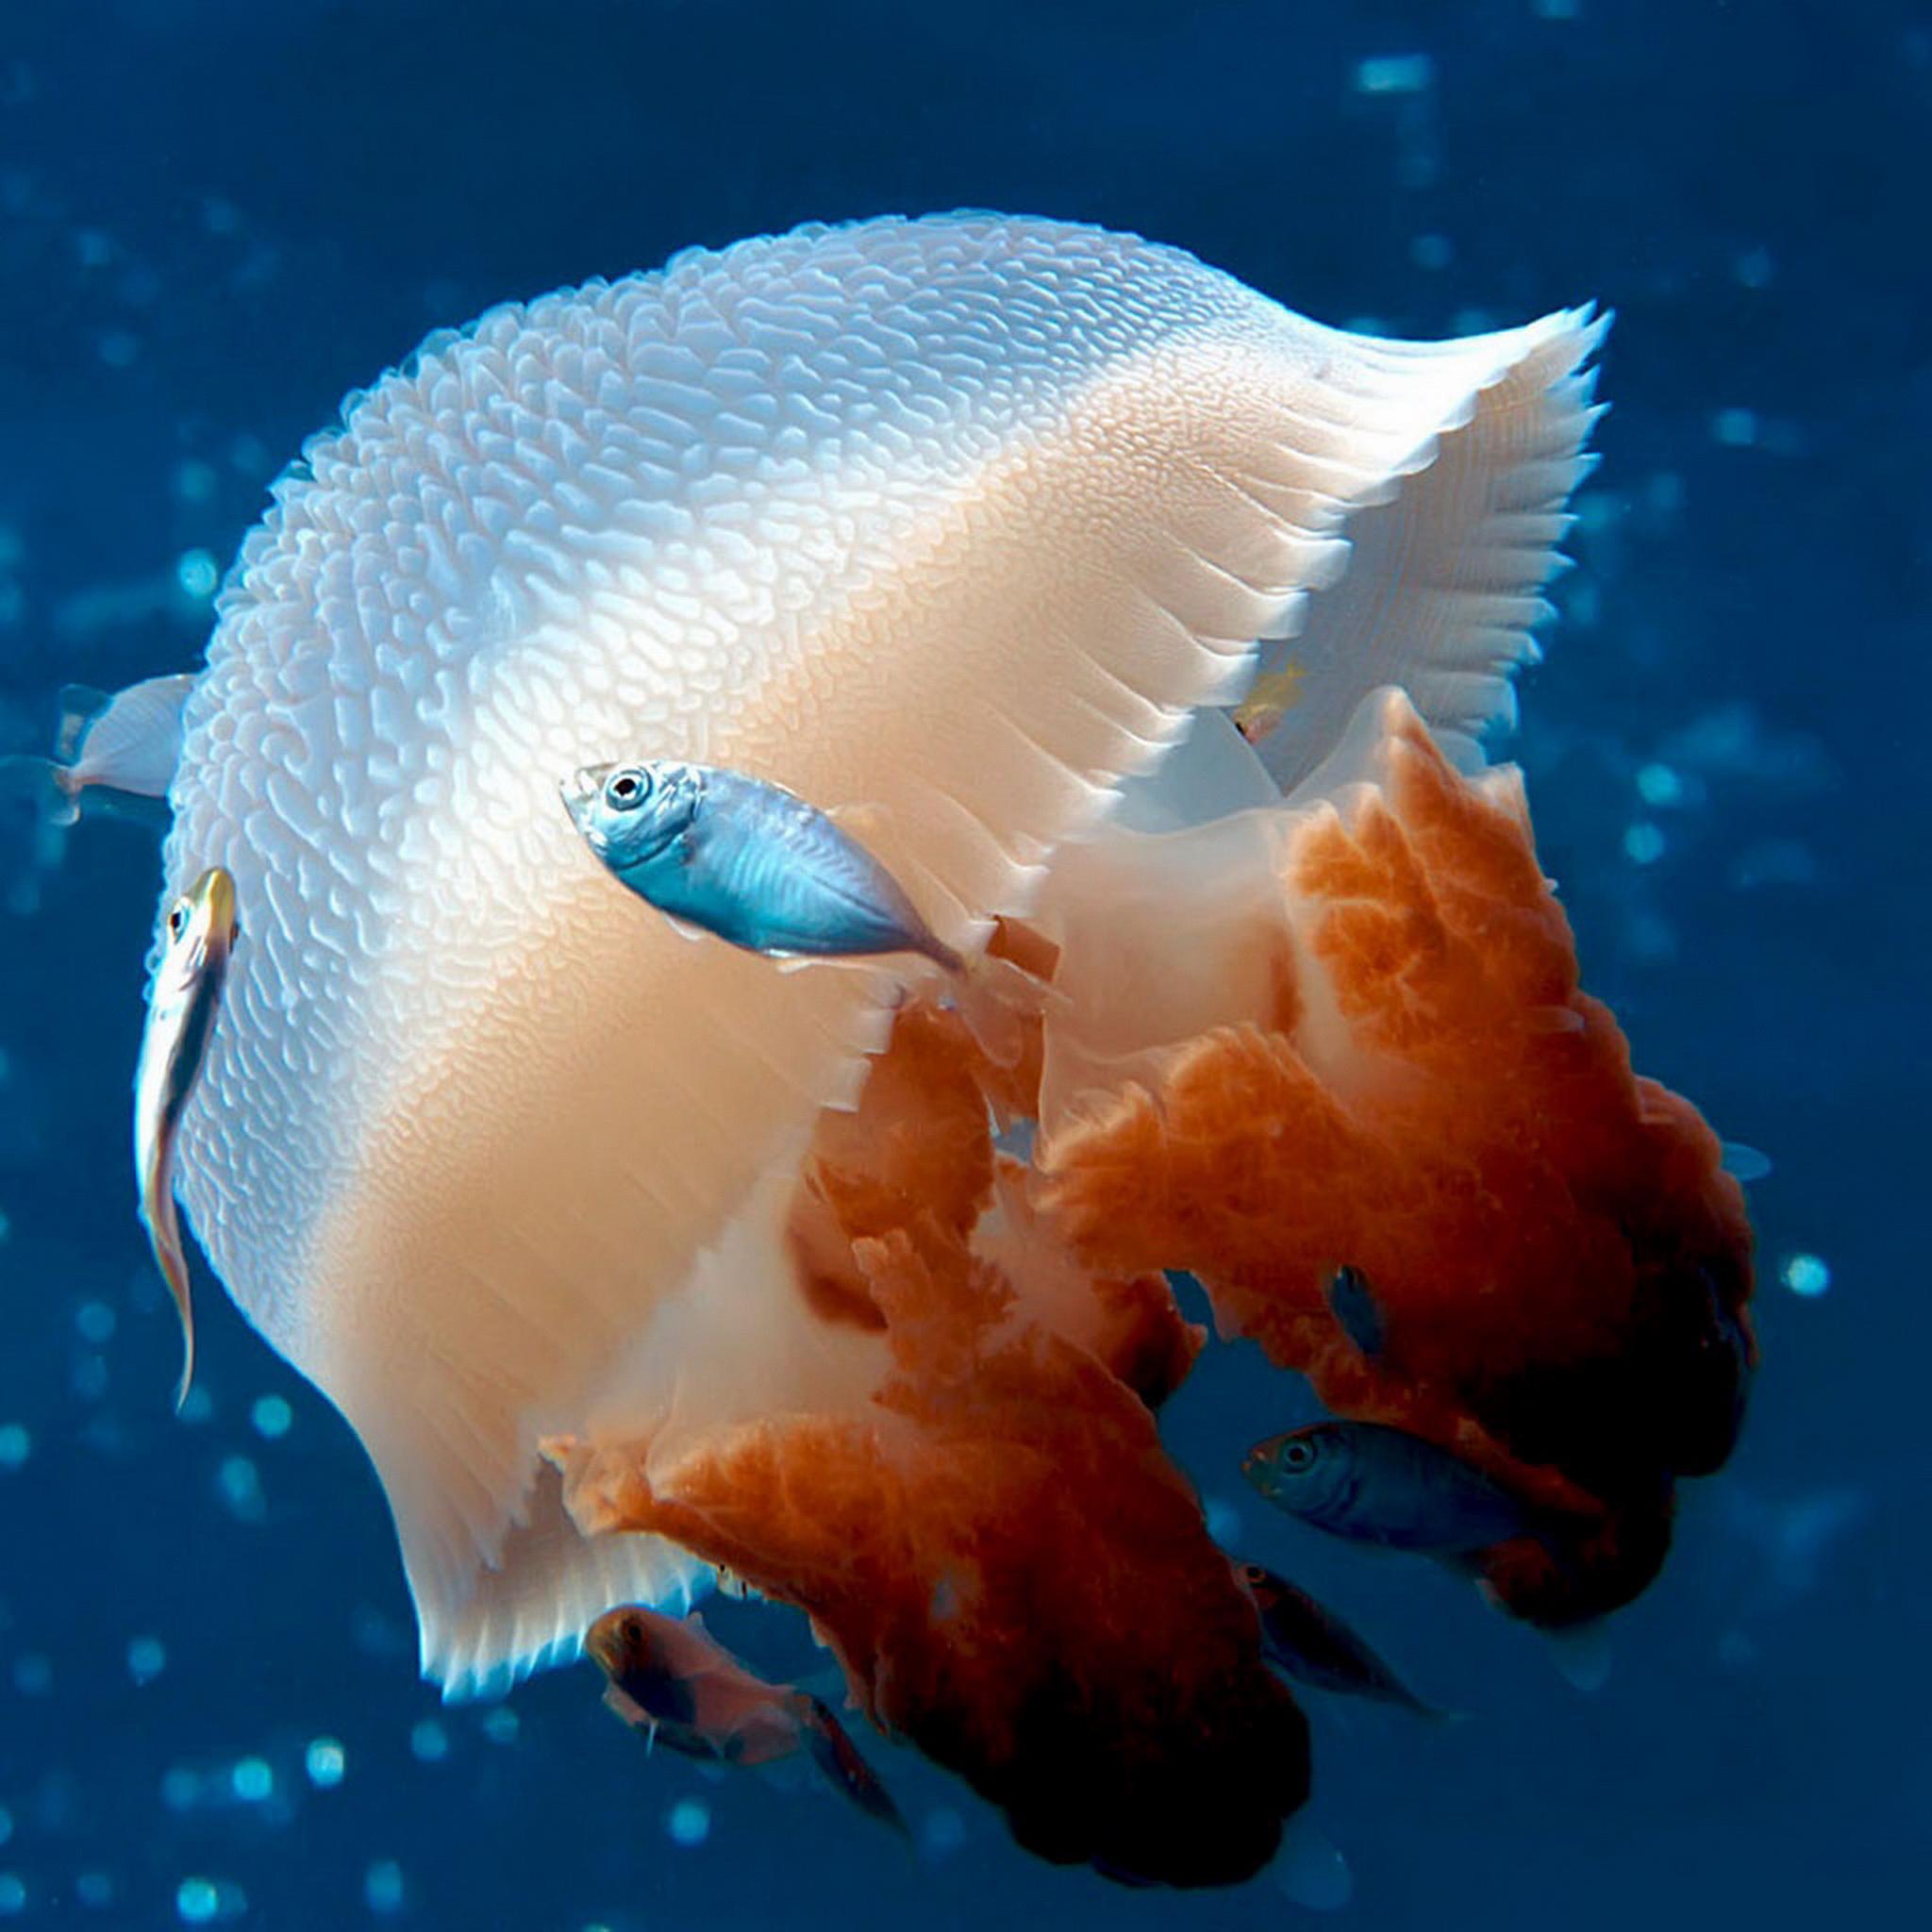 Jellyfish-3Wallpapers-iPad-Retina